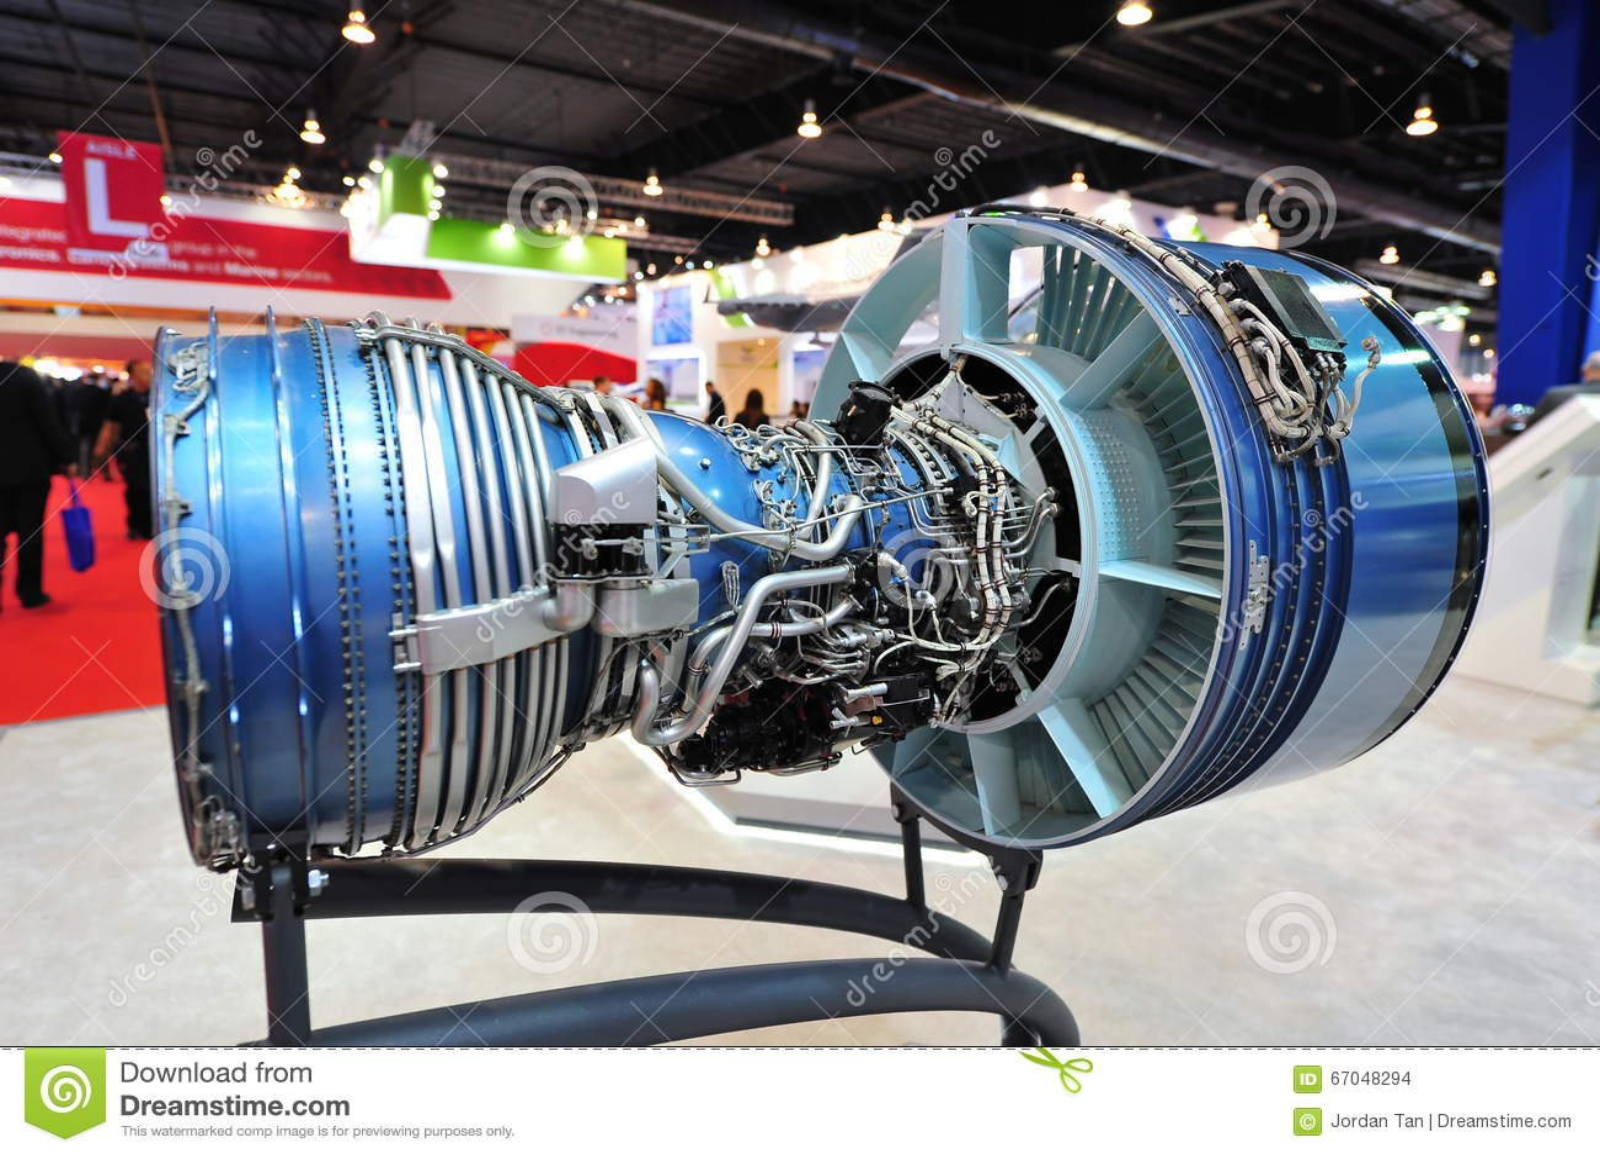 Pratt & Whitney Displaying Their PW4000 High By-pass Turbo